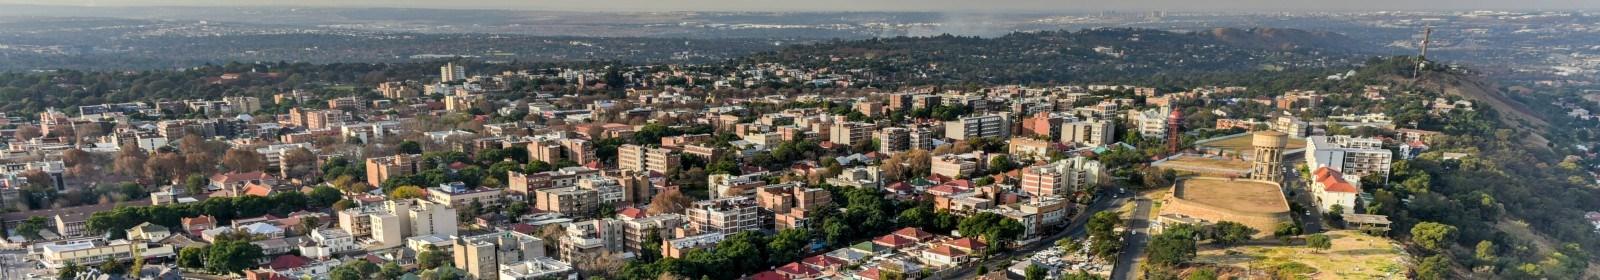 Overview of the current Gauteng rental market